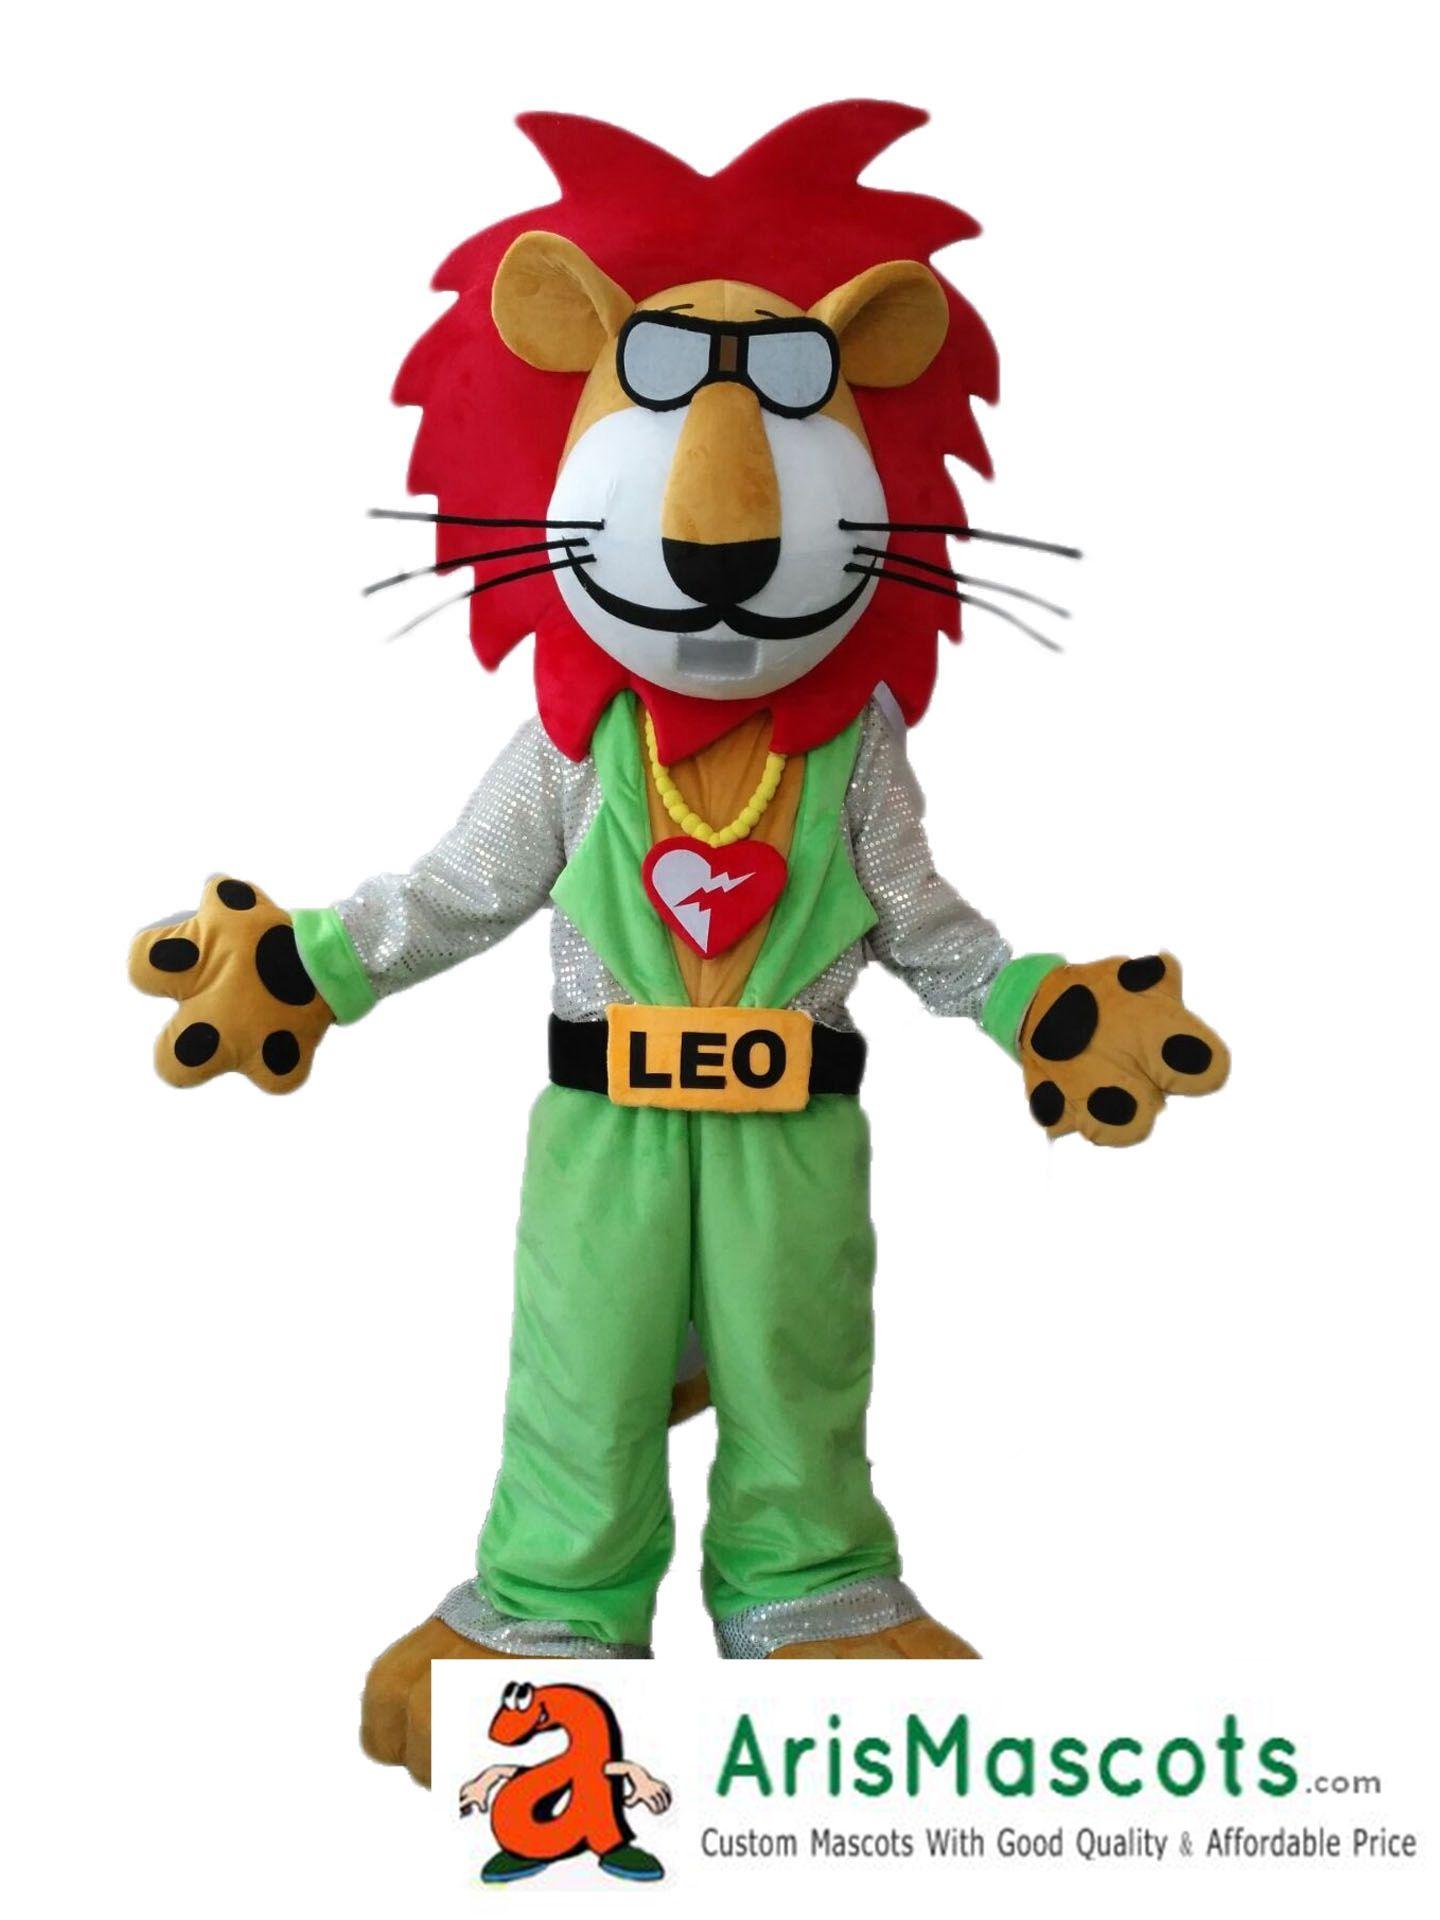 af50f0e89 AM8946 Disco Lion Mascot Costume For Party Custom Team Mascots Sports Mascot  Costume Desuisement Mascotte Character Design ArisMascots Spiderman  Costumes ...